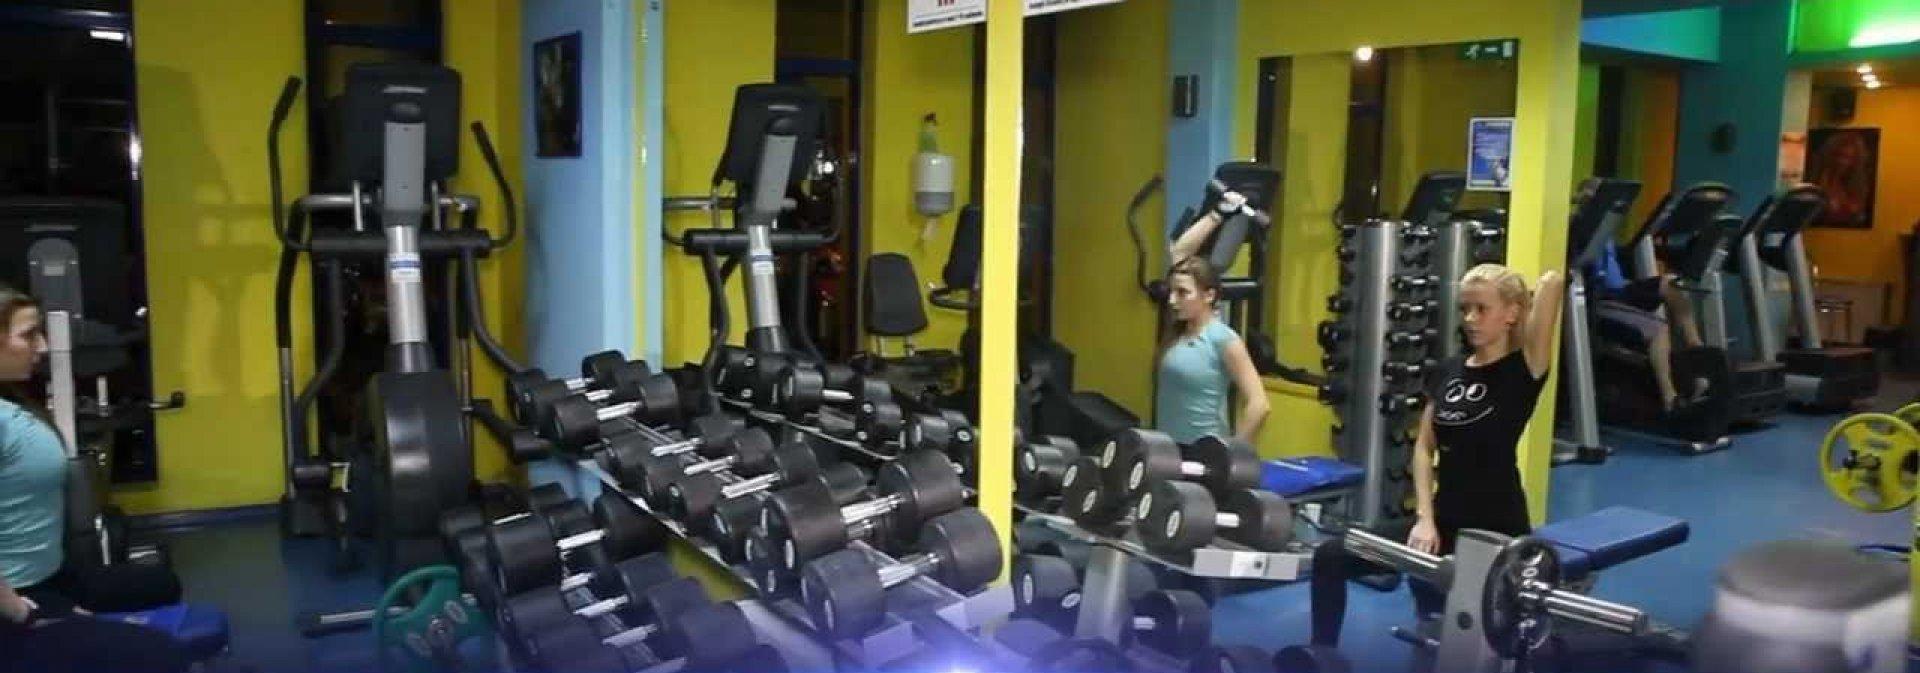 ENERGY PLUS Fitness Studio, Cluj-Napoca, Cluj